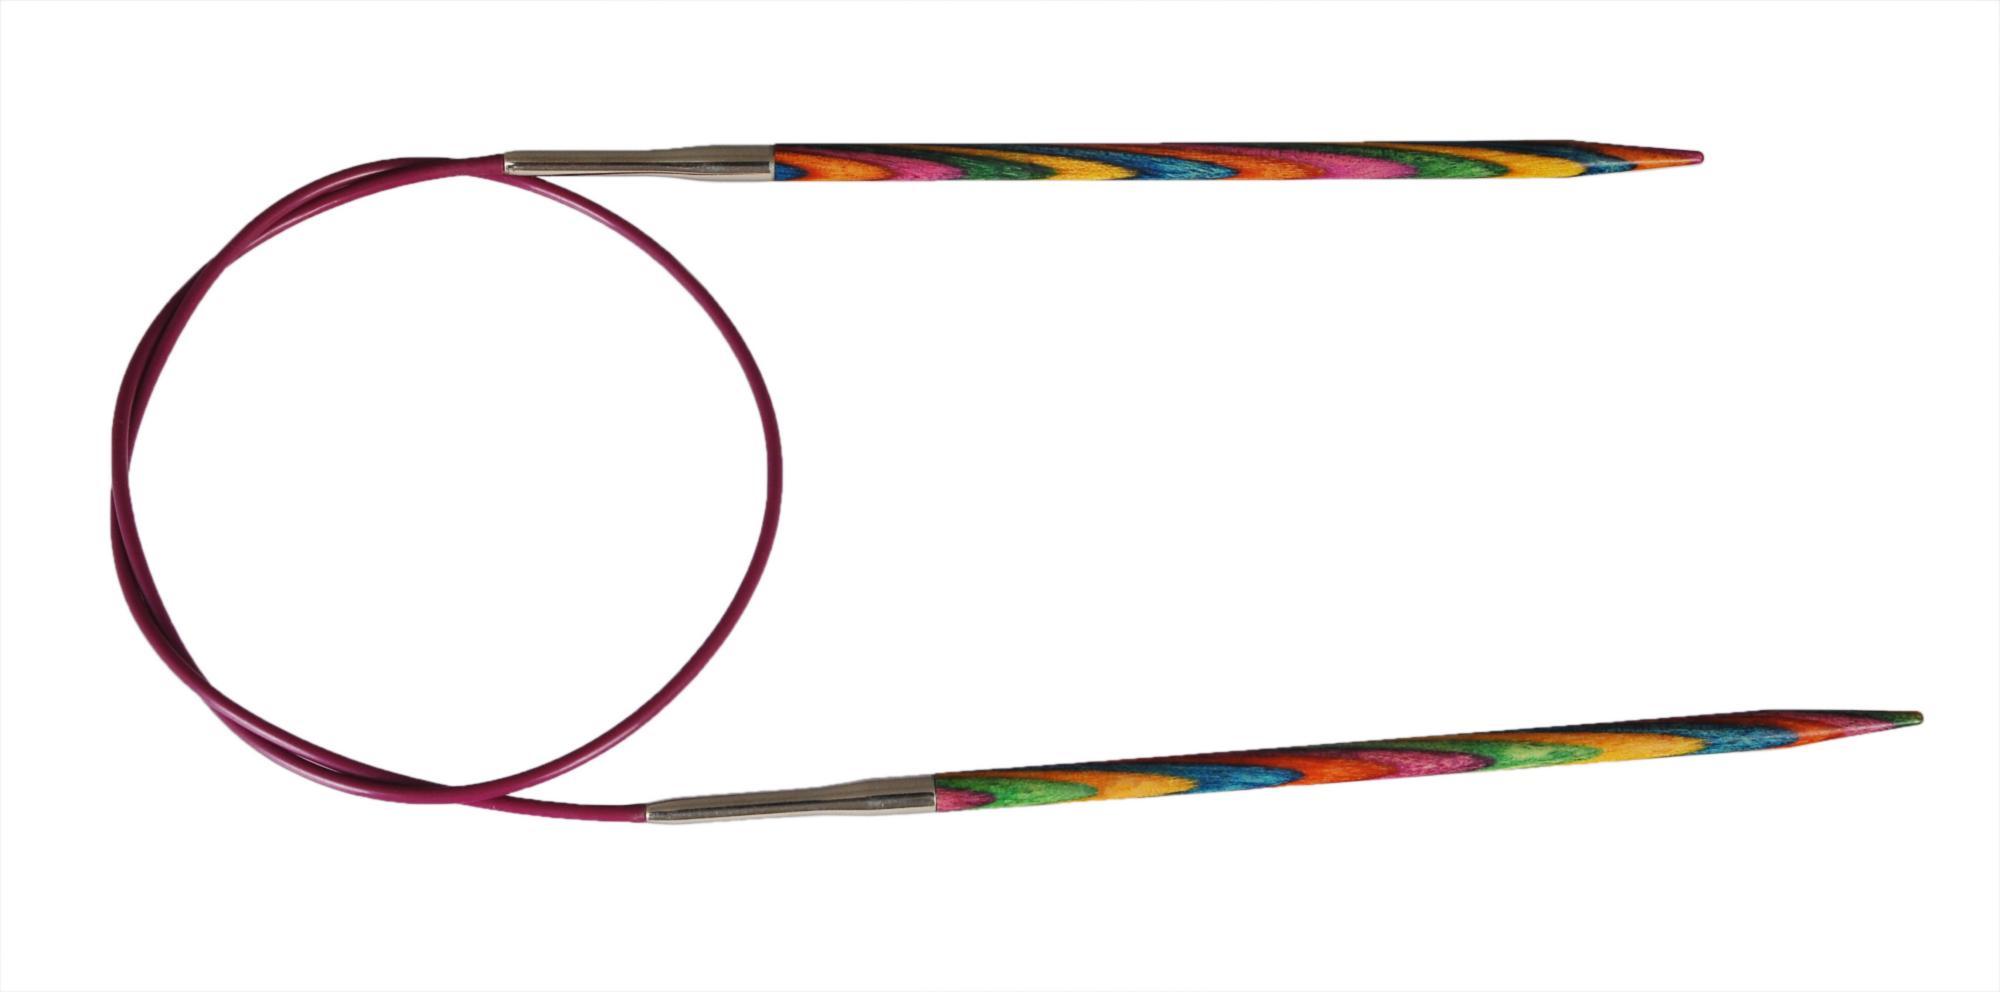 Спицы круговые 100 см Symfonie Wood KnitPro, 21353, 4.50 мм